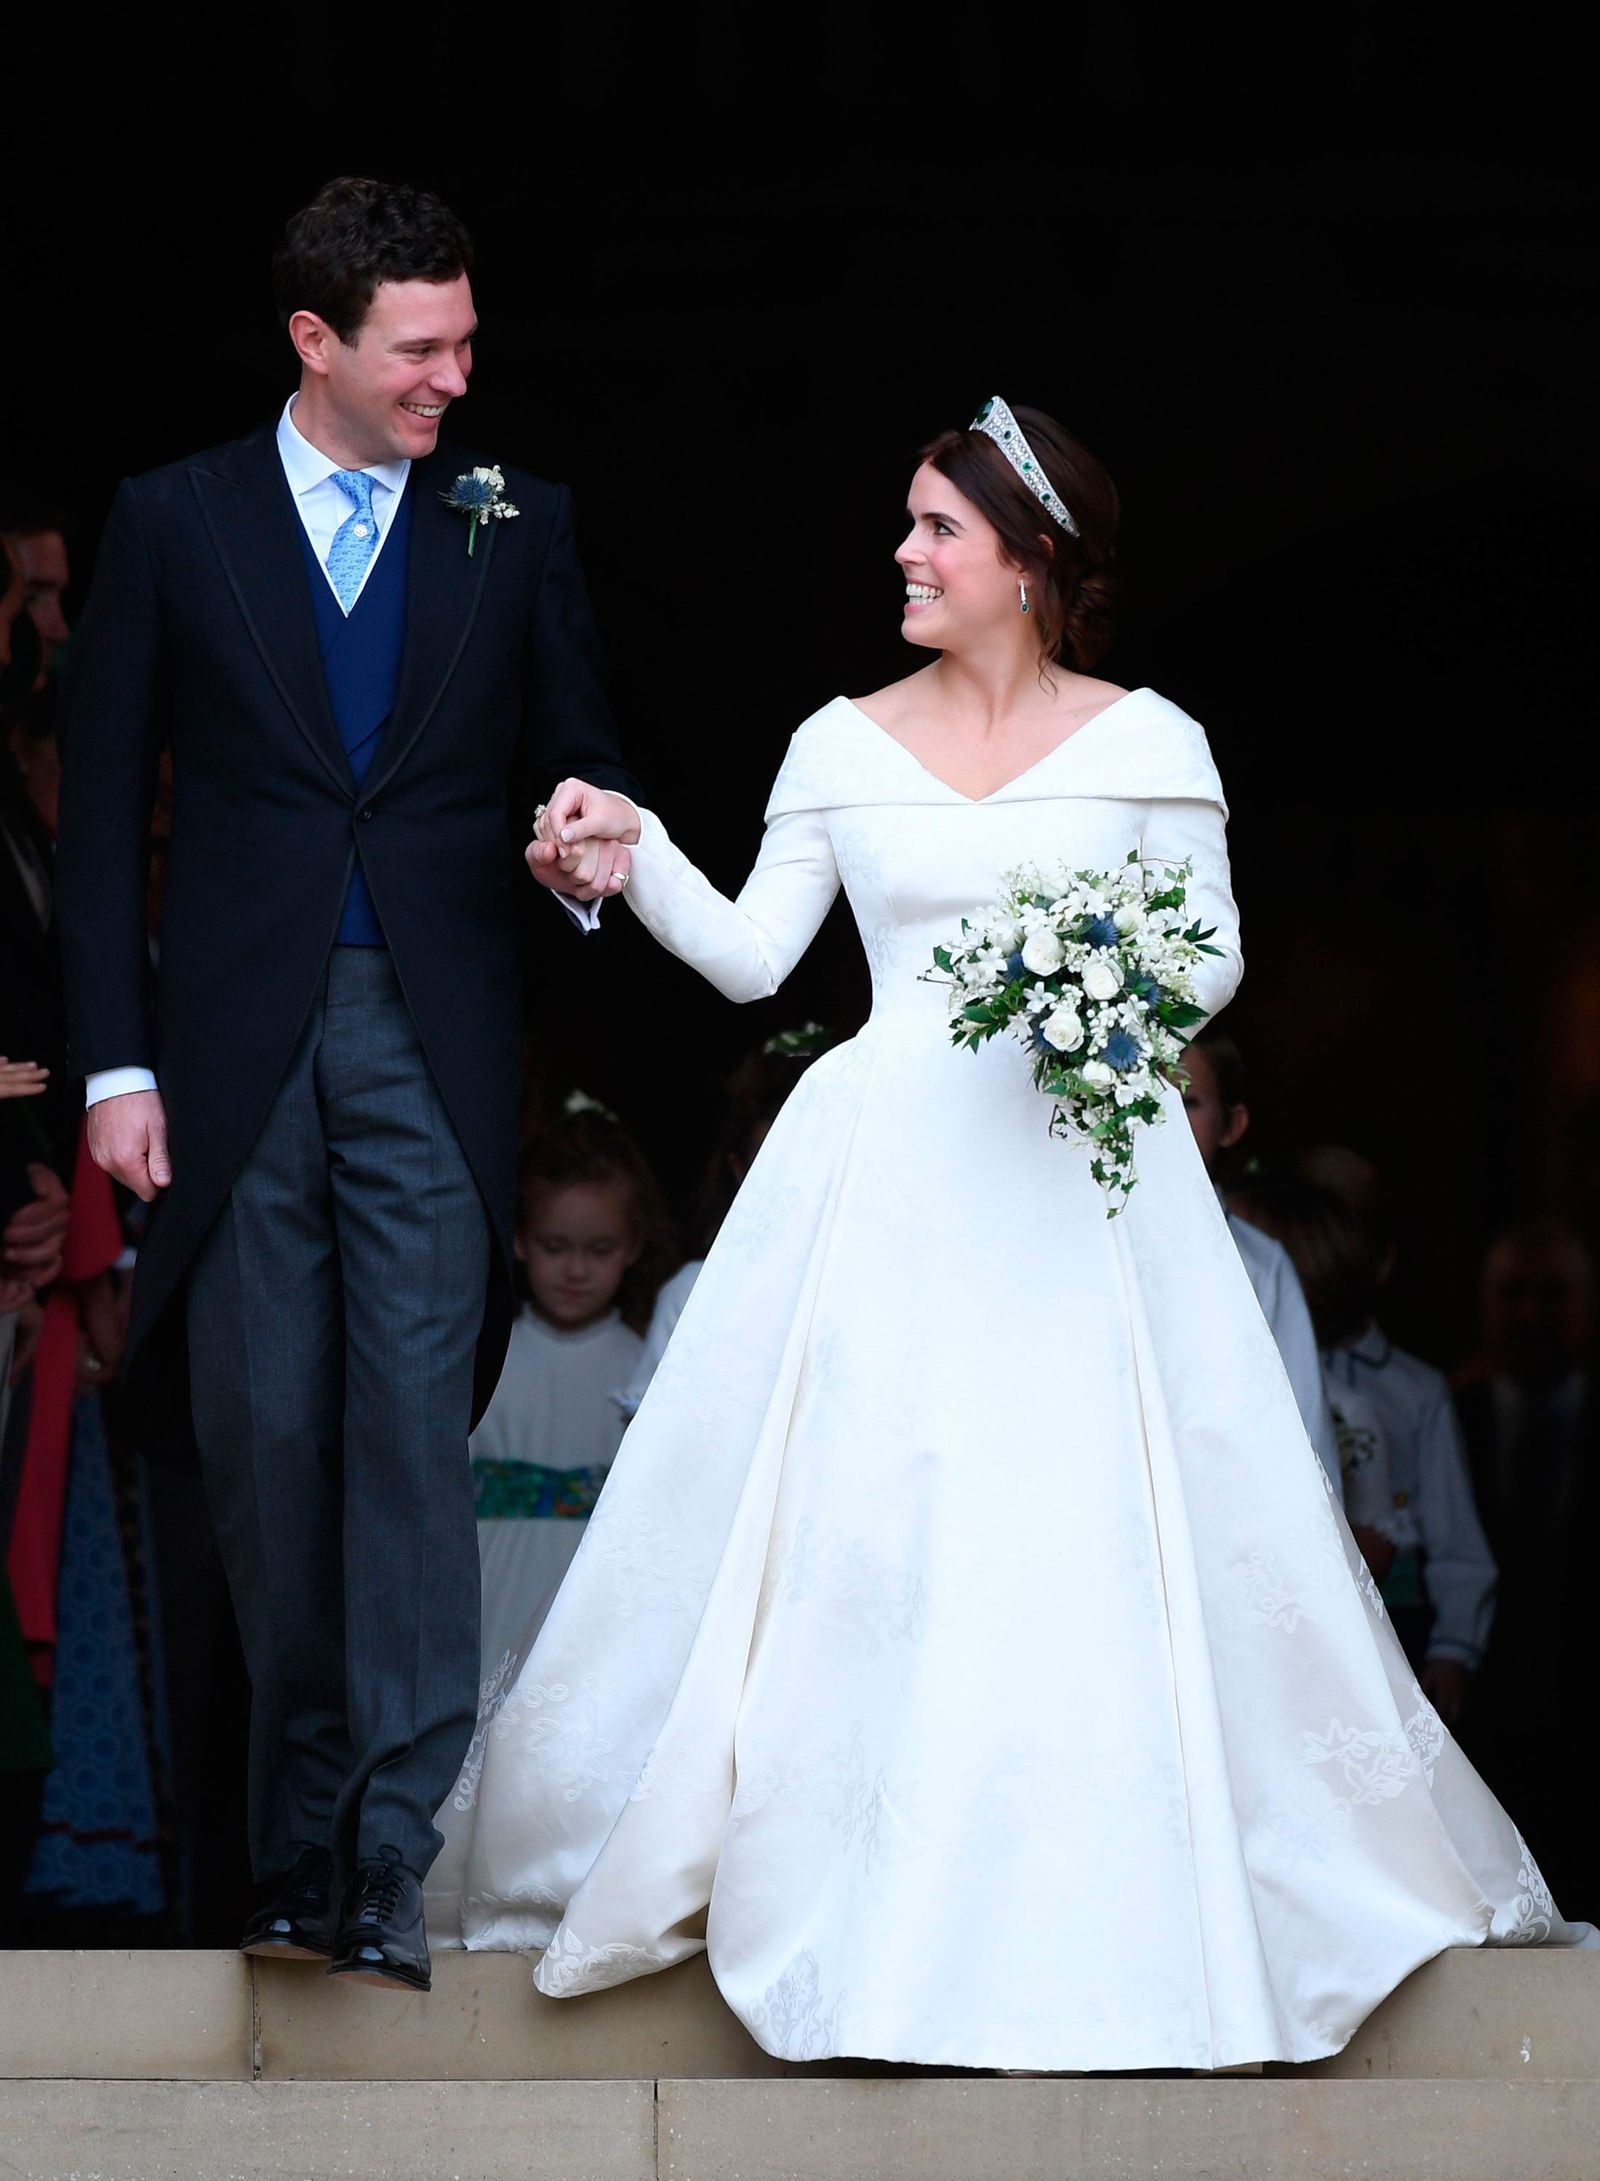 Princess Eugenie S Wedding In Pictures Eugenie Wedding Second Wedding Dresses Wedding Dresses [ 2181 x 1600 Pixel ]